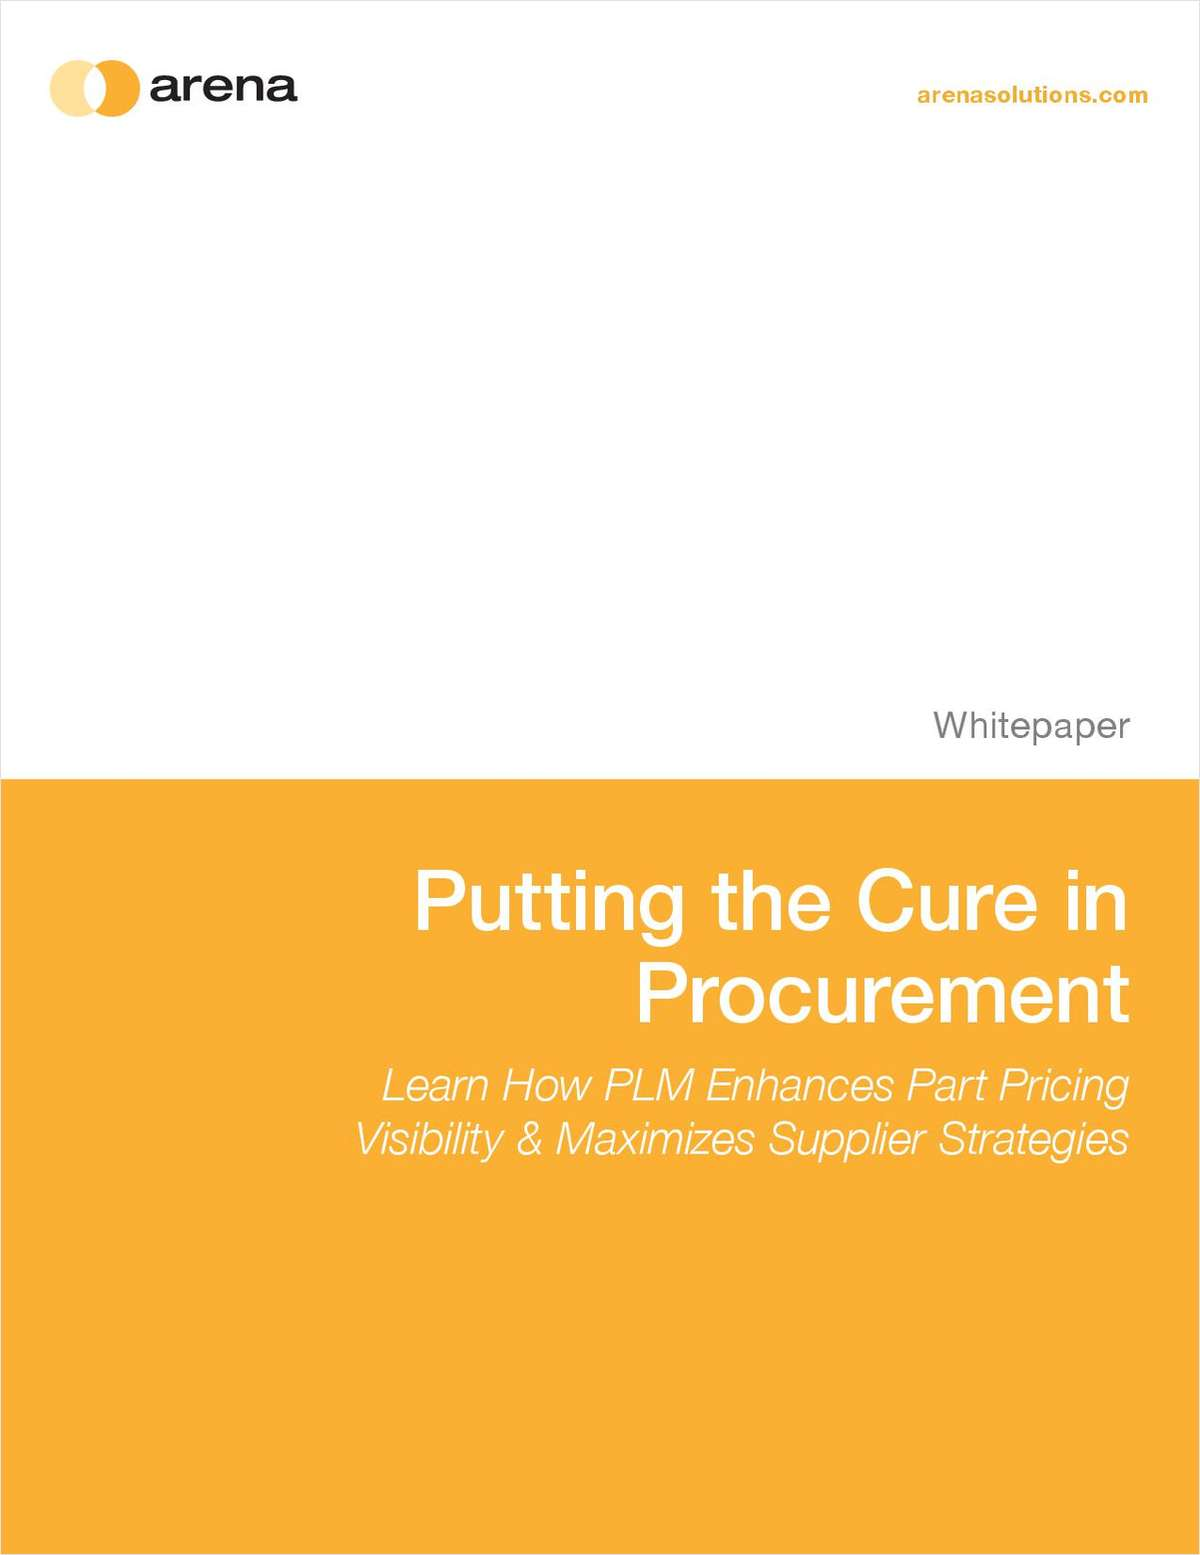 Putting the Cure in Procurement